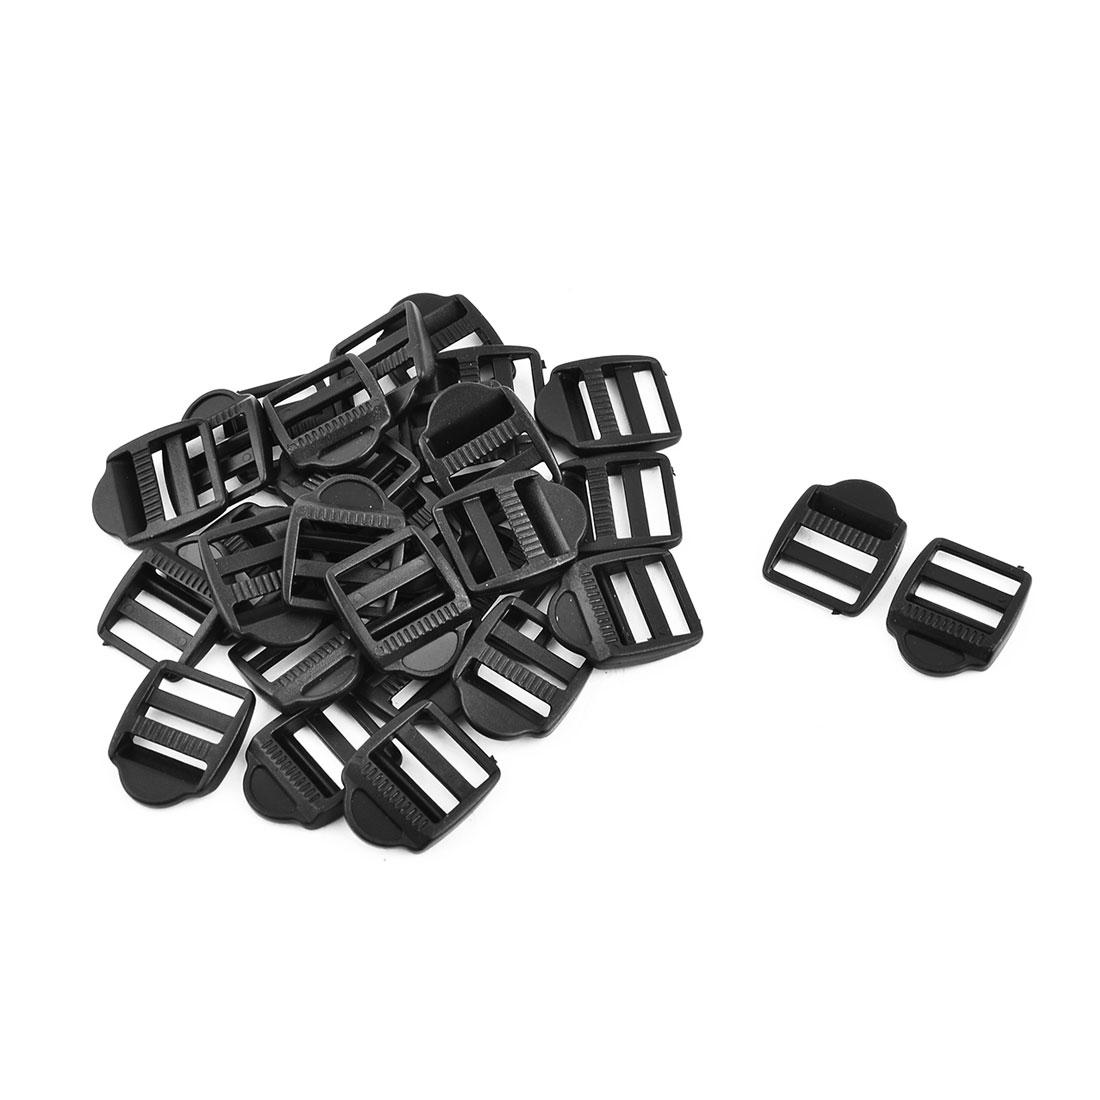 Hiking Handbag Webbing Plastic Adjustable Rectangle Ladder Lock Fastener Buckle 30pcs